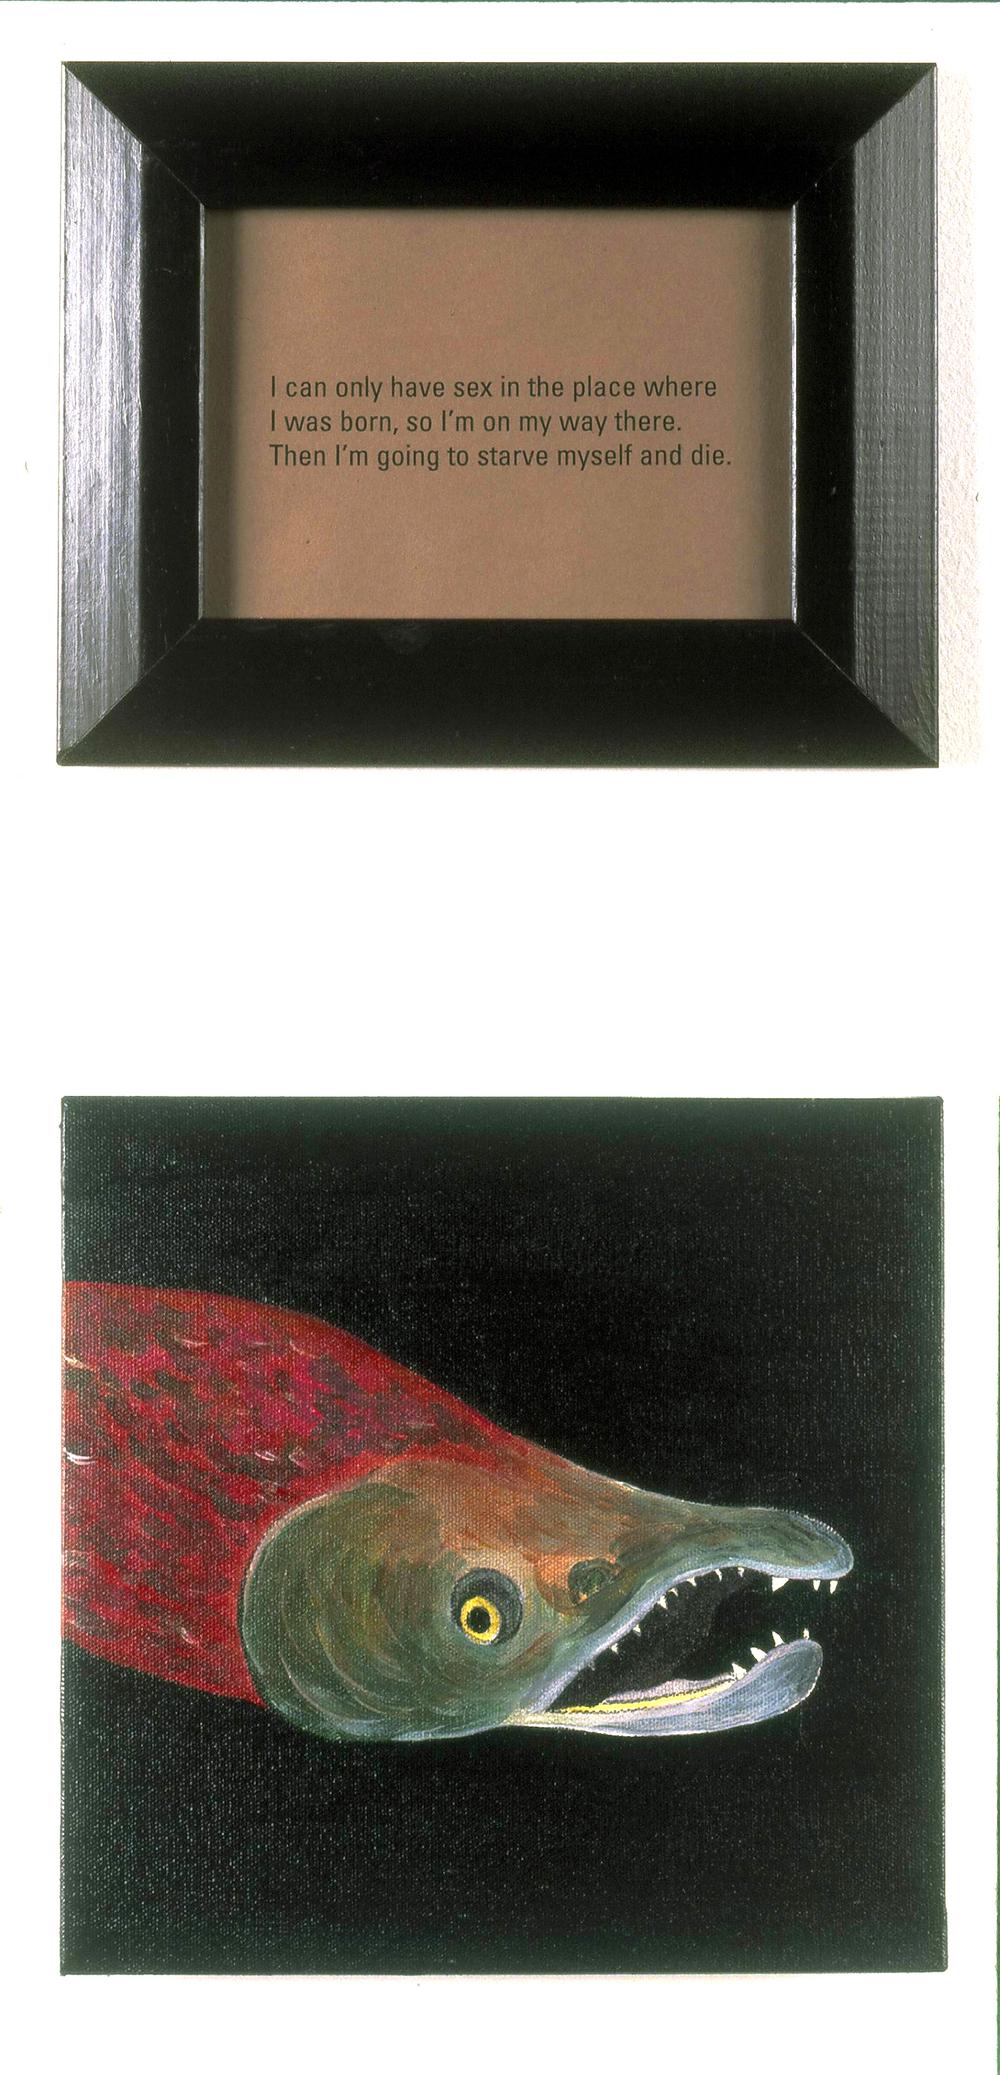 Sex Lives of Animals: Salmon, 1995